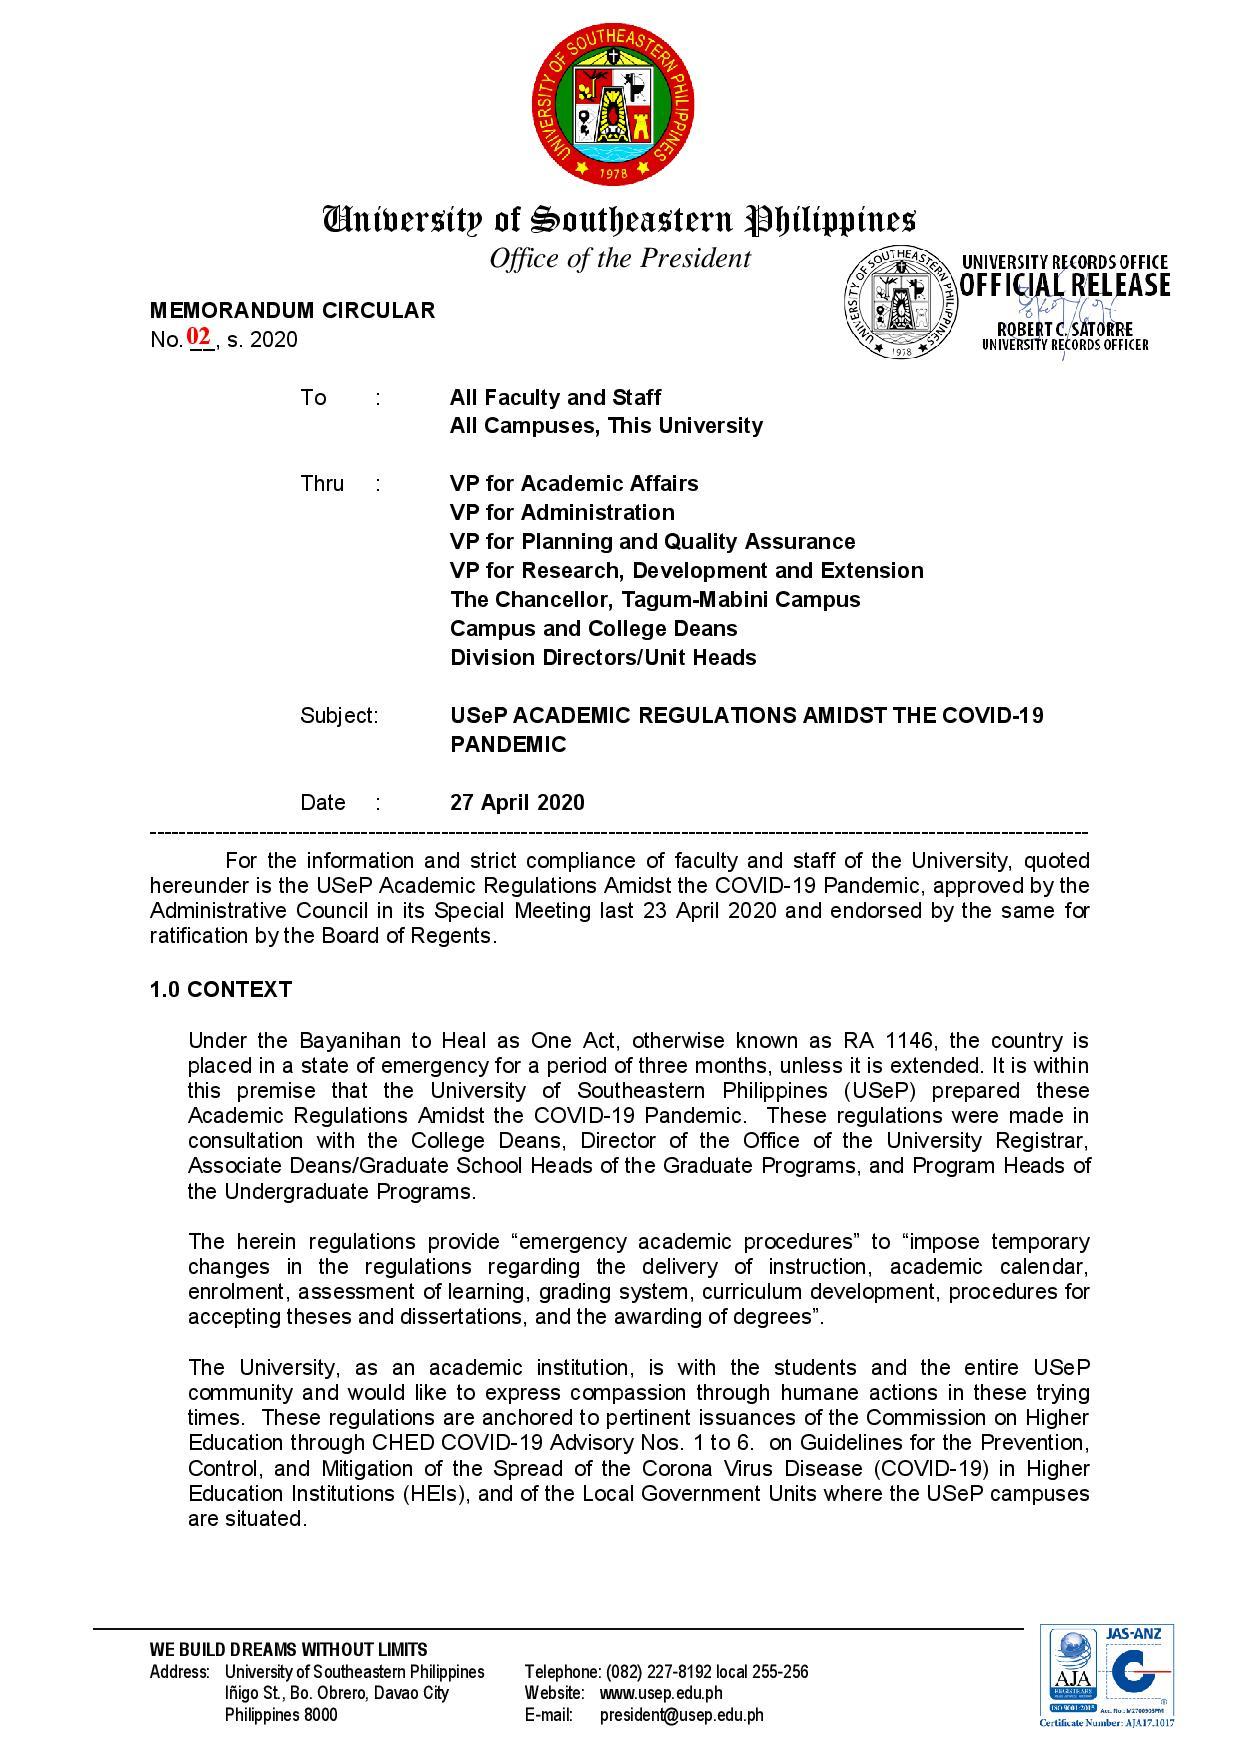 mc-02-s-2020-memorandum-circular-on-usep-academic-regulations-amidst-the-covid-19-pandemic-page-001